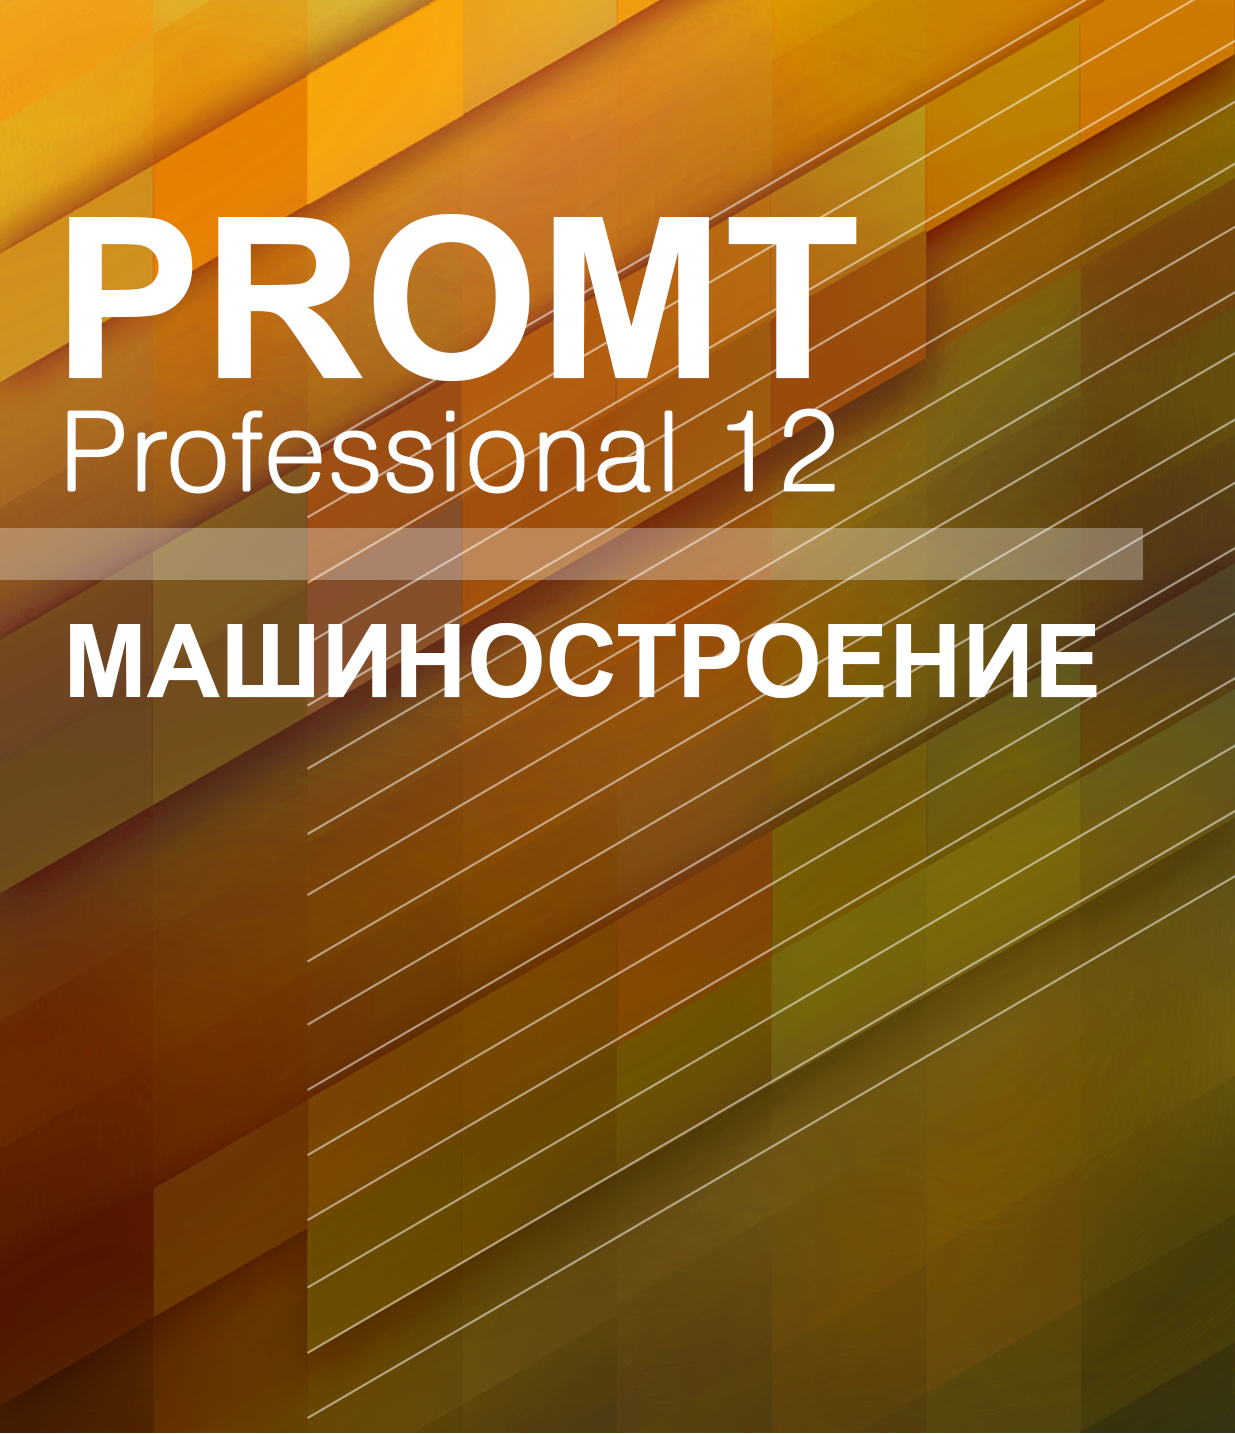 PROMT Professional Машиностроение